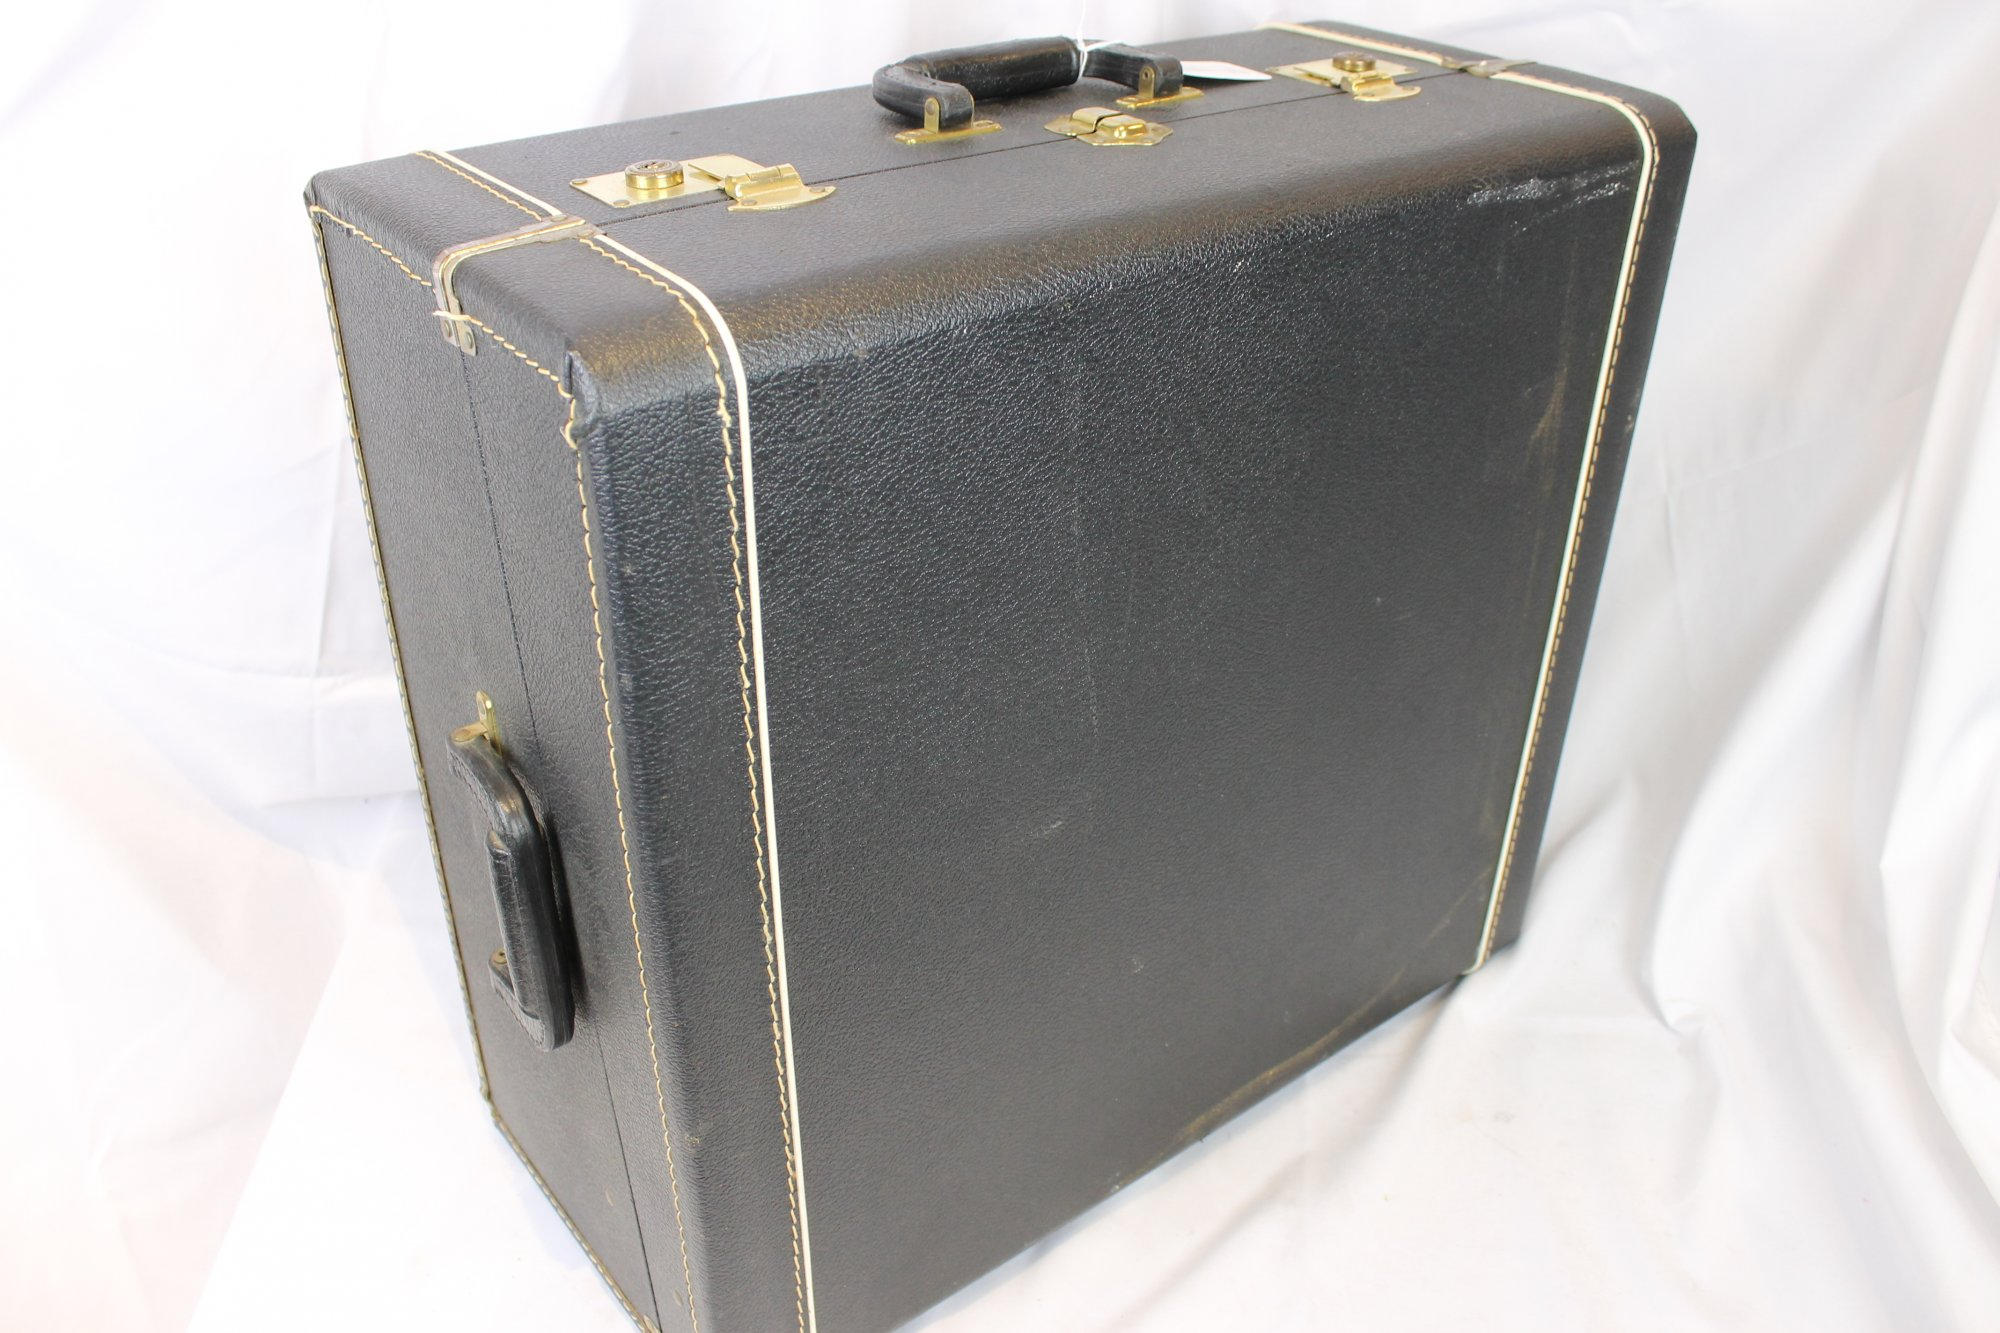 Black Giulietti Accordion Hard Case 20 x 18.5 x 9 (51cm x 47cm x 23cm)